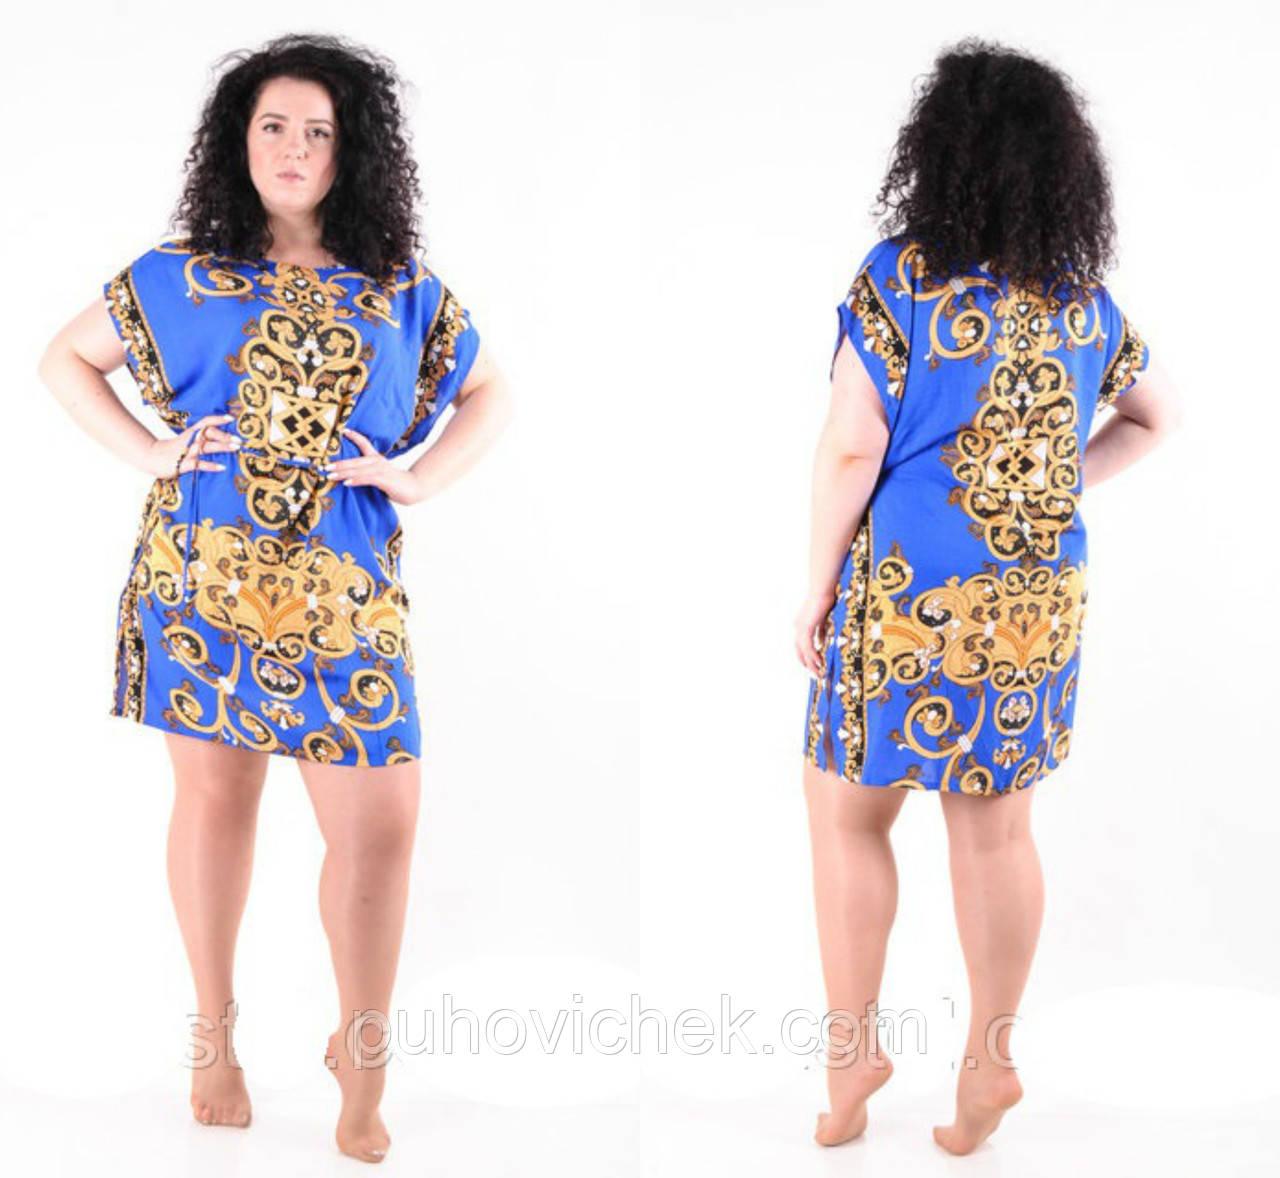 Летнее женское платье туника красивое размеры 50-54